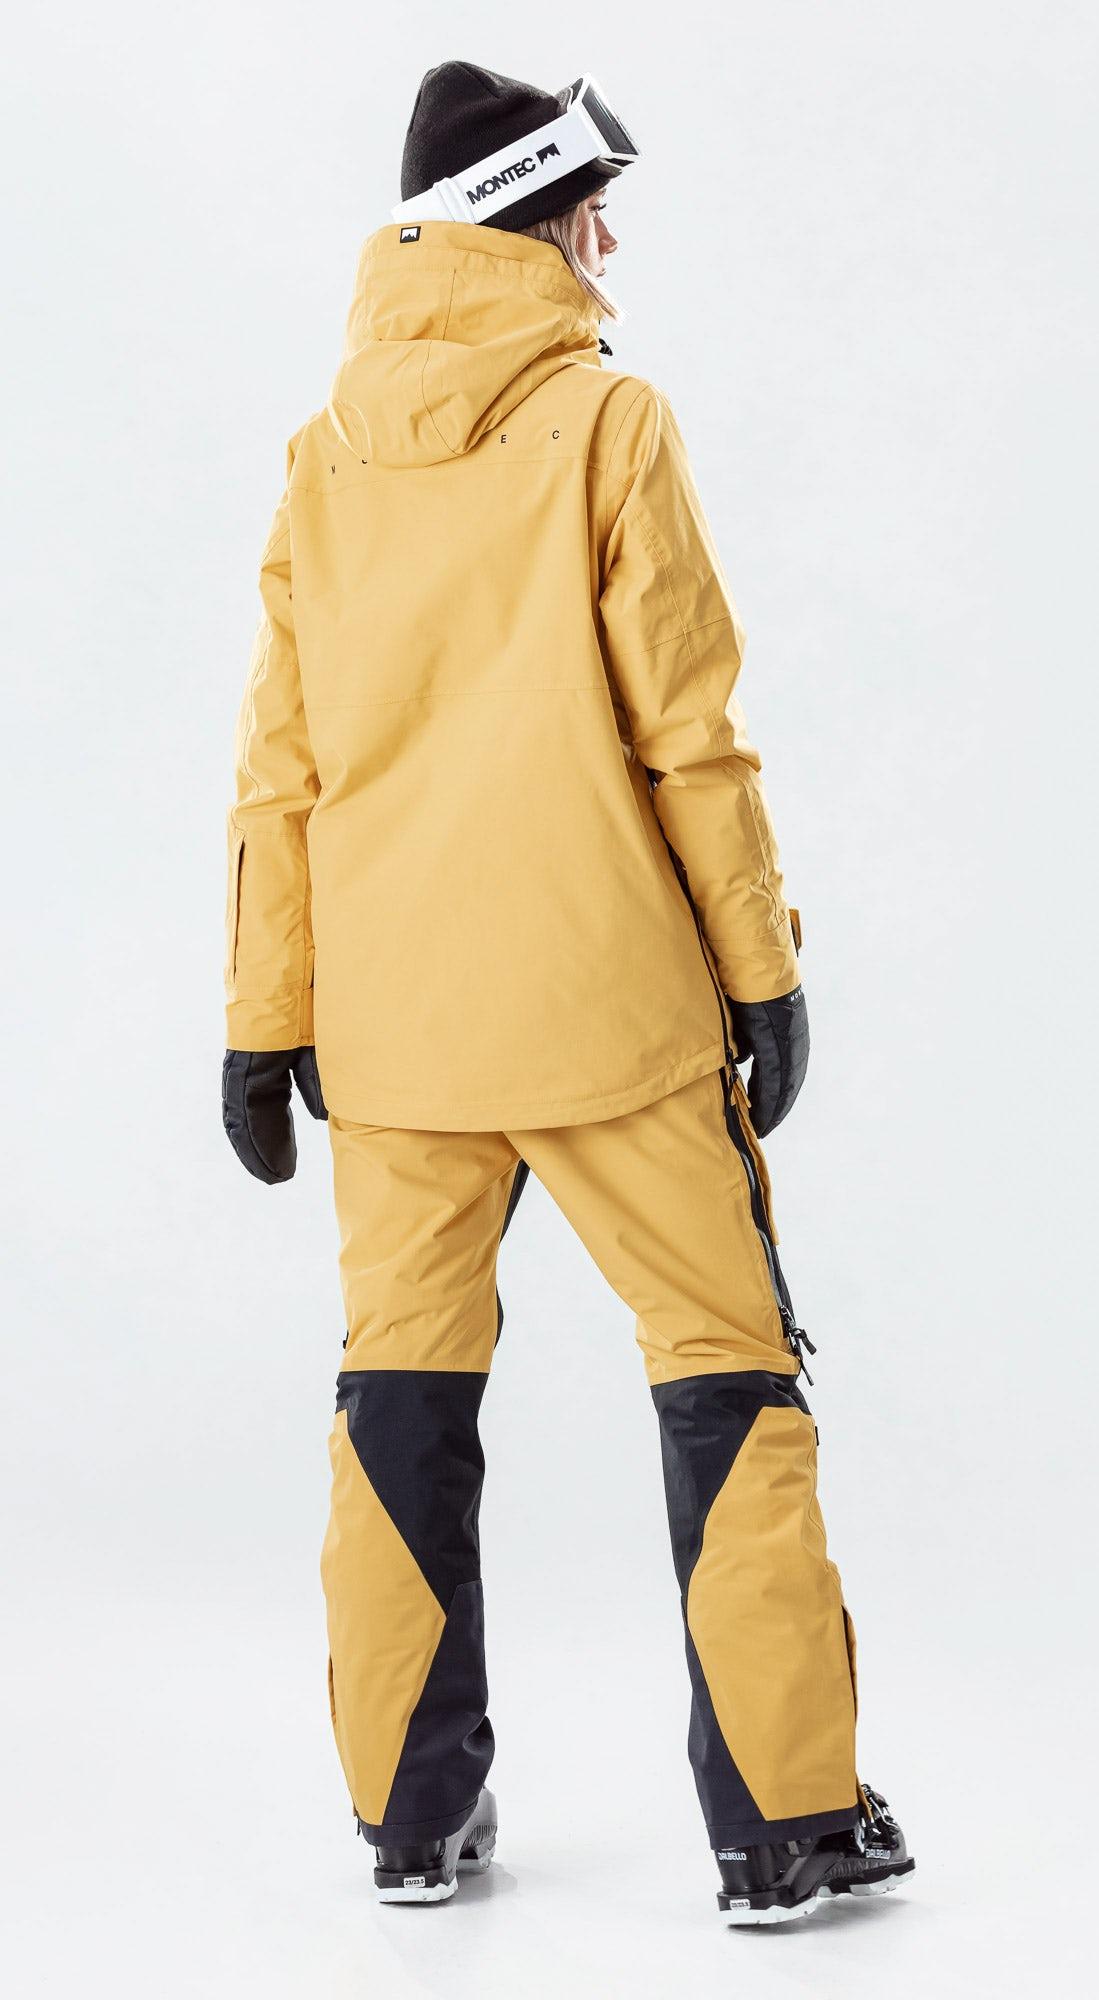 Montec Dune W Yellow